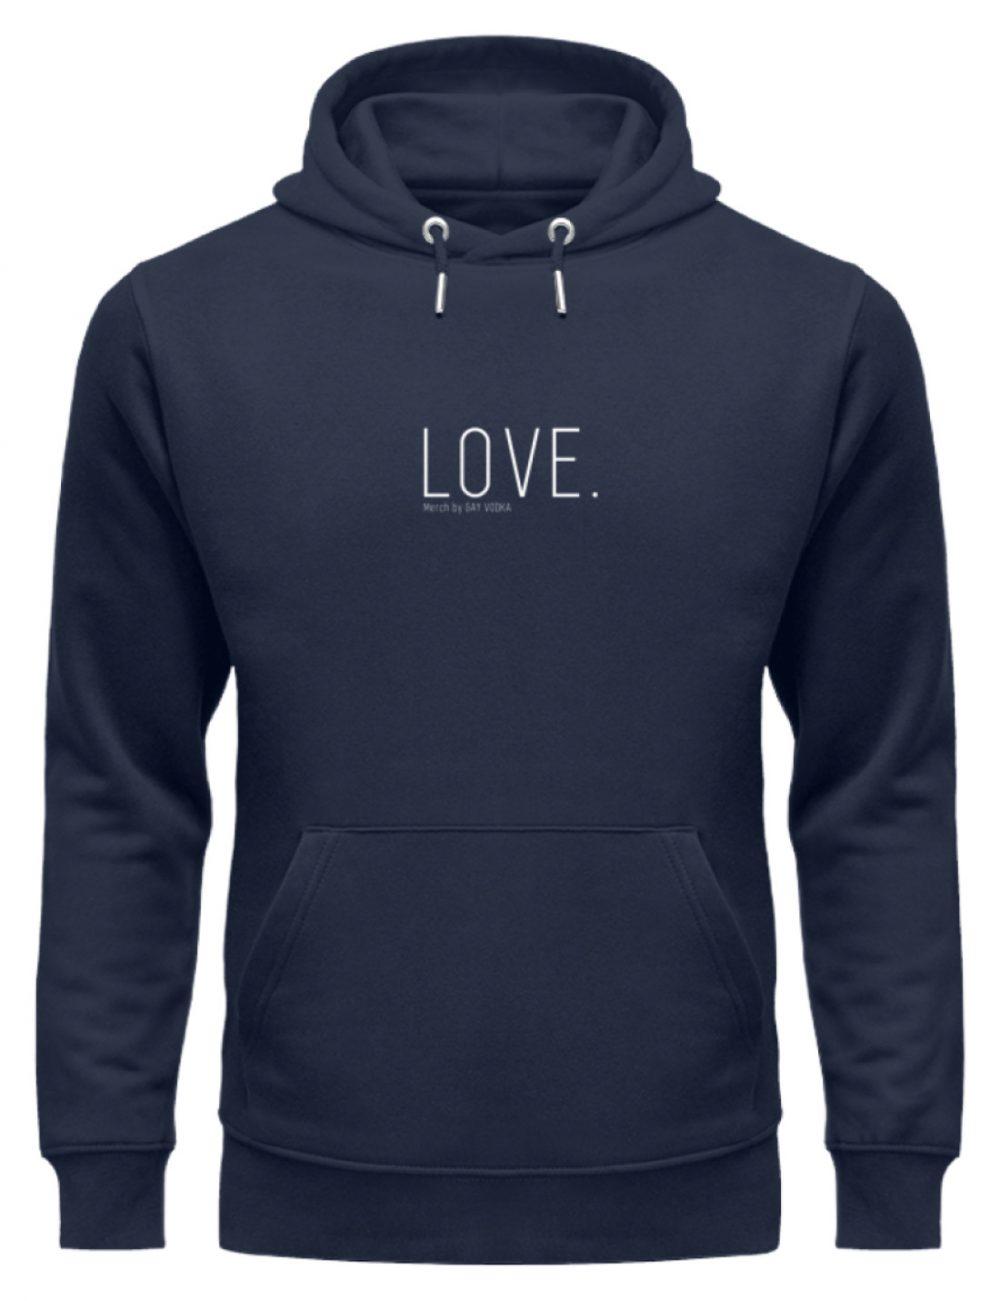 LOVE. - Unisex Organic Hoodie-6887